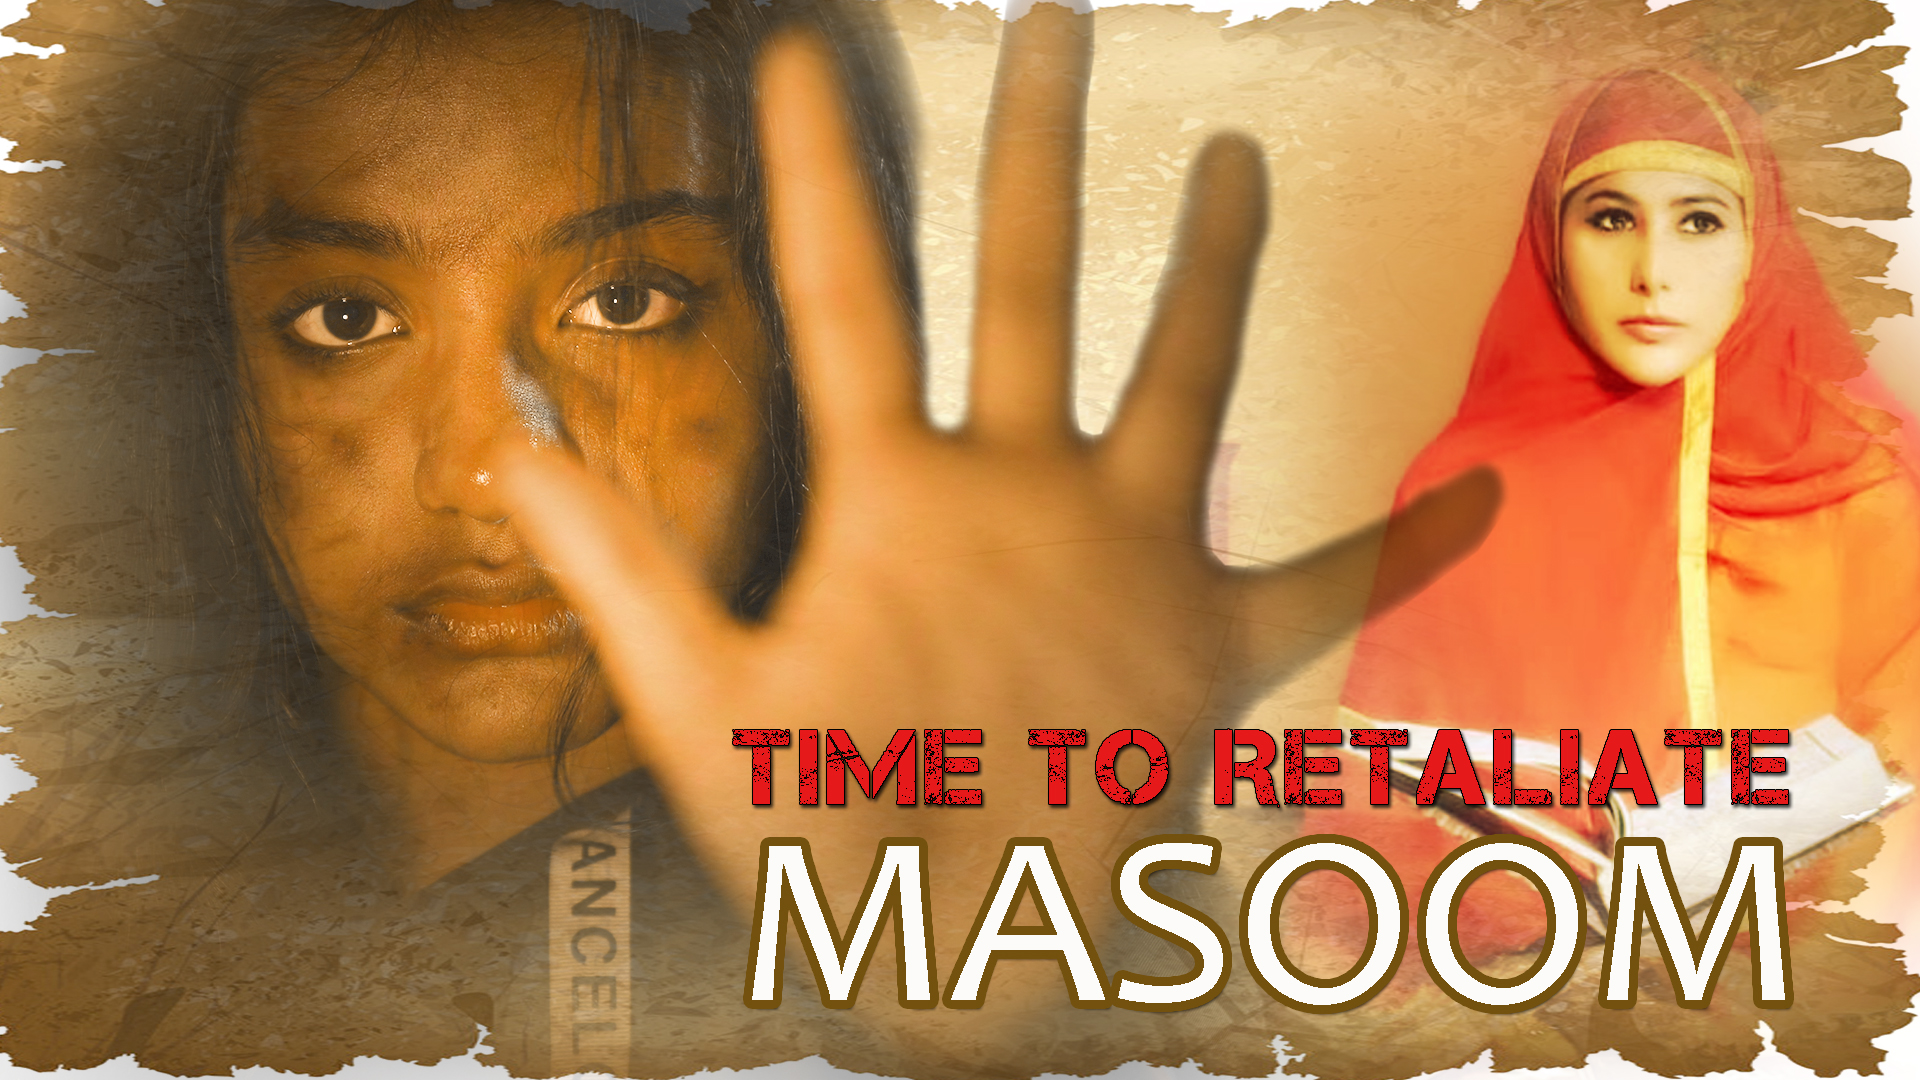 Time To Retaliate: Masoom on Amazon Prime Video UK